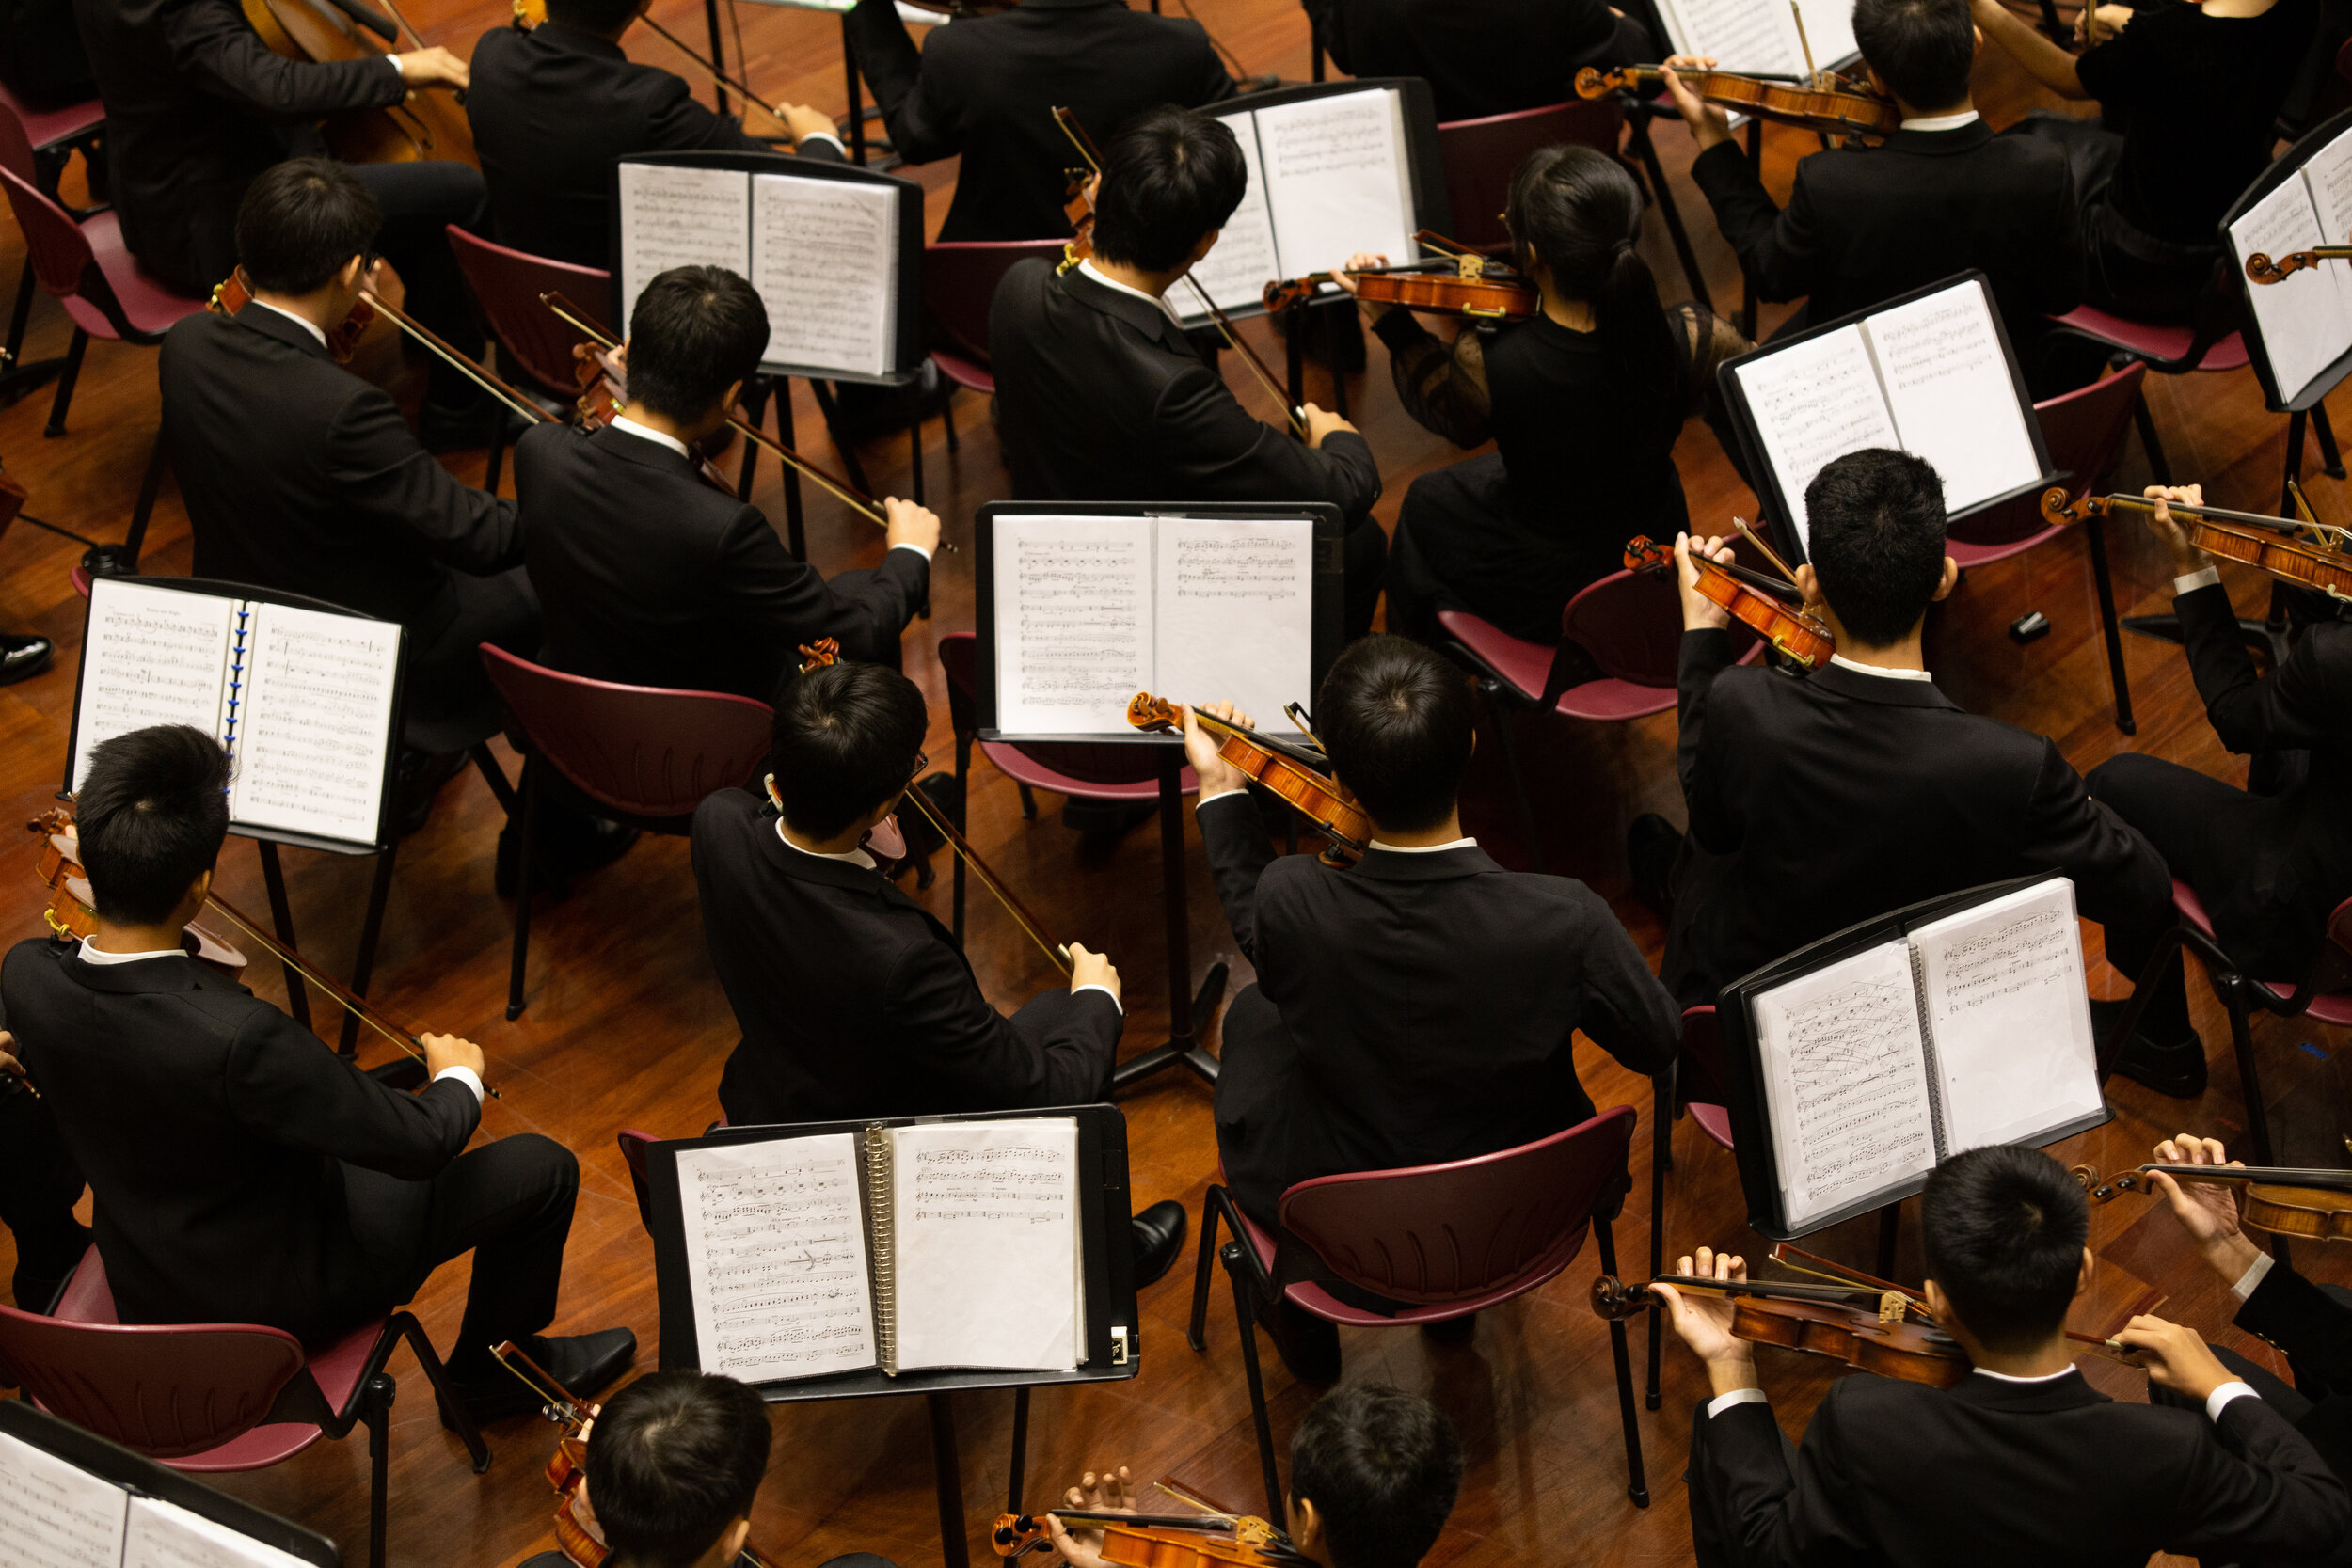 Exaltation Orchestra - Interim Director - Mercer CrookAssistant Interim Director - Sarah Dunn